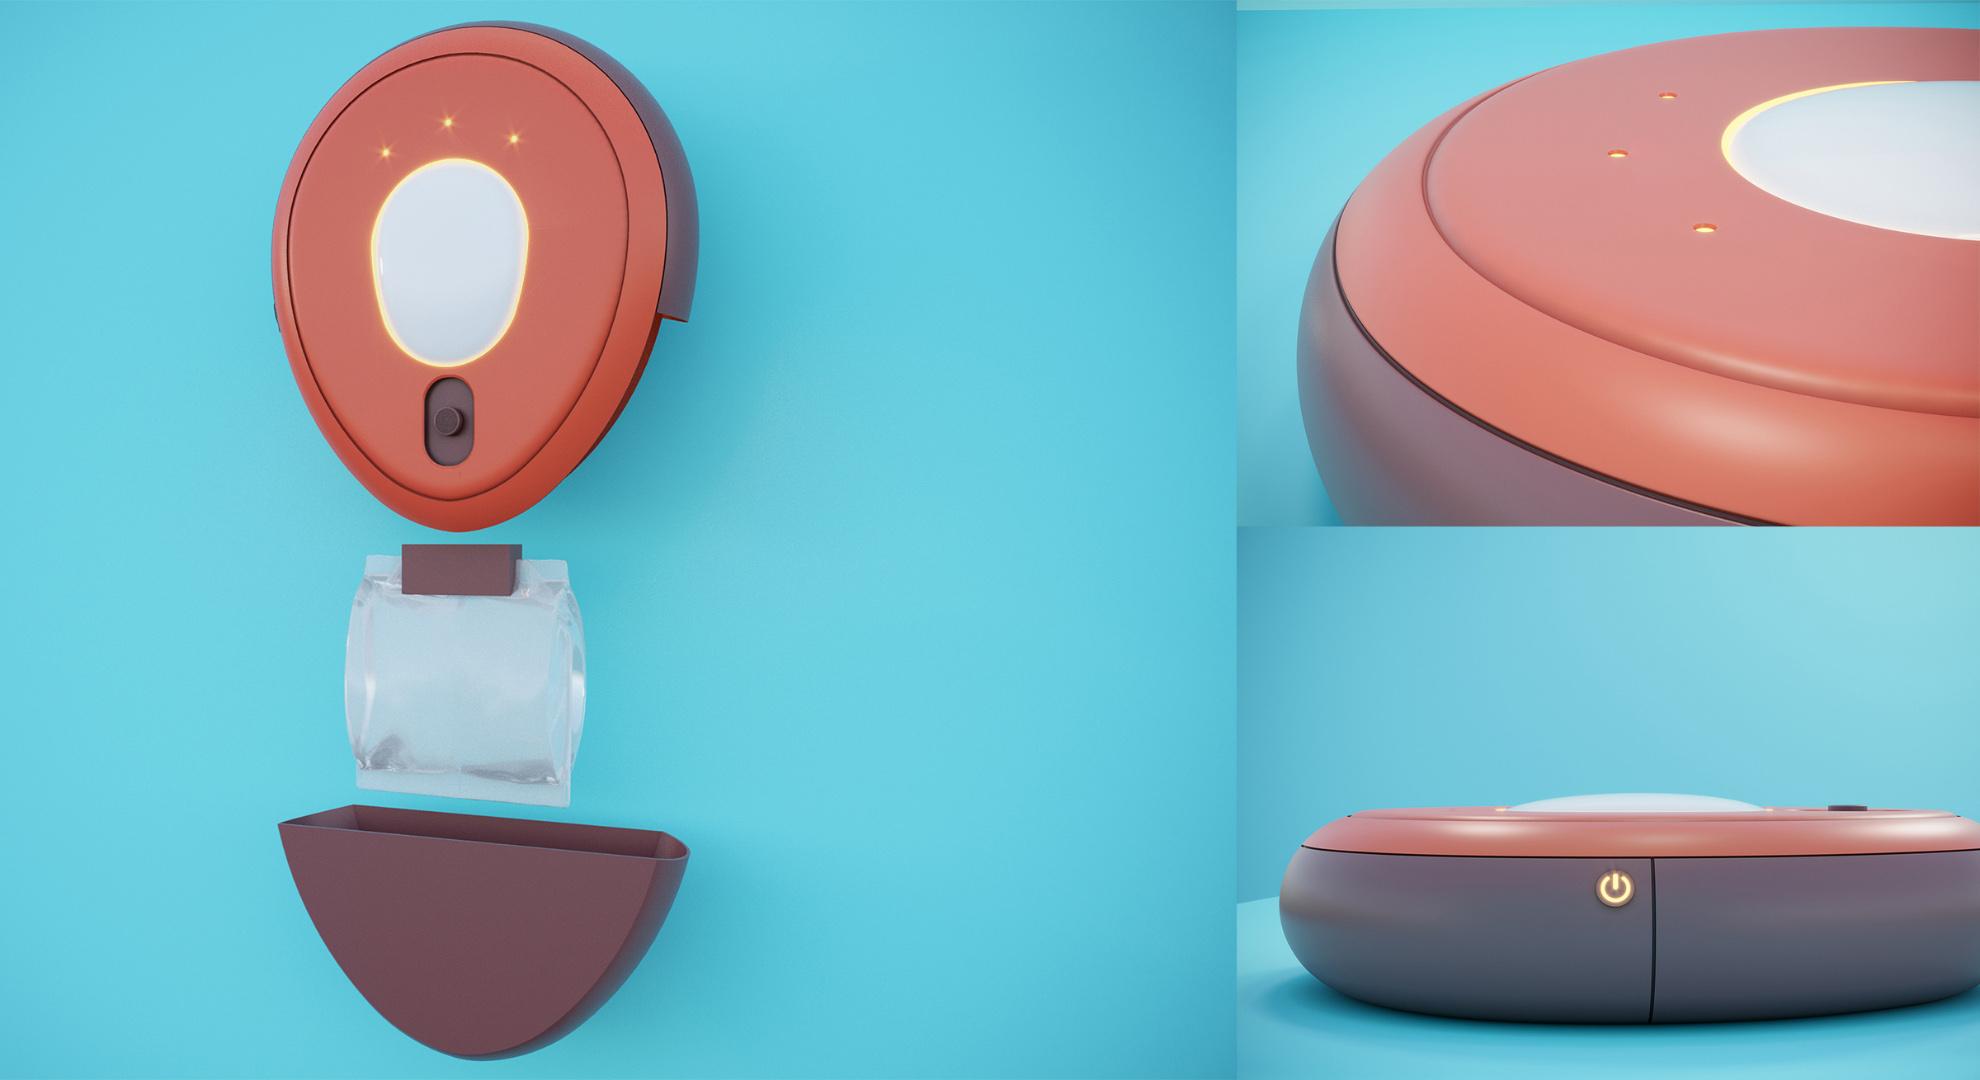 The edutainment project Bubble Bump measures body temperature.